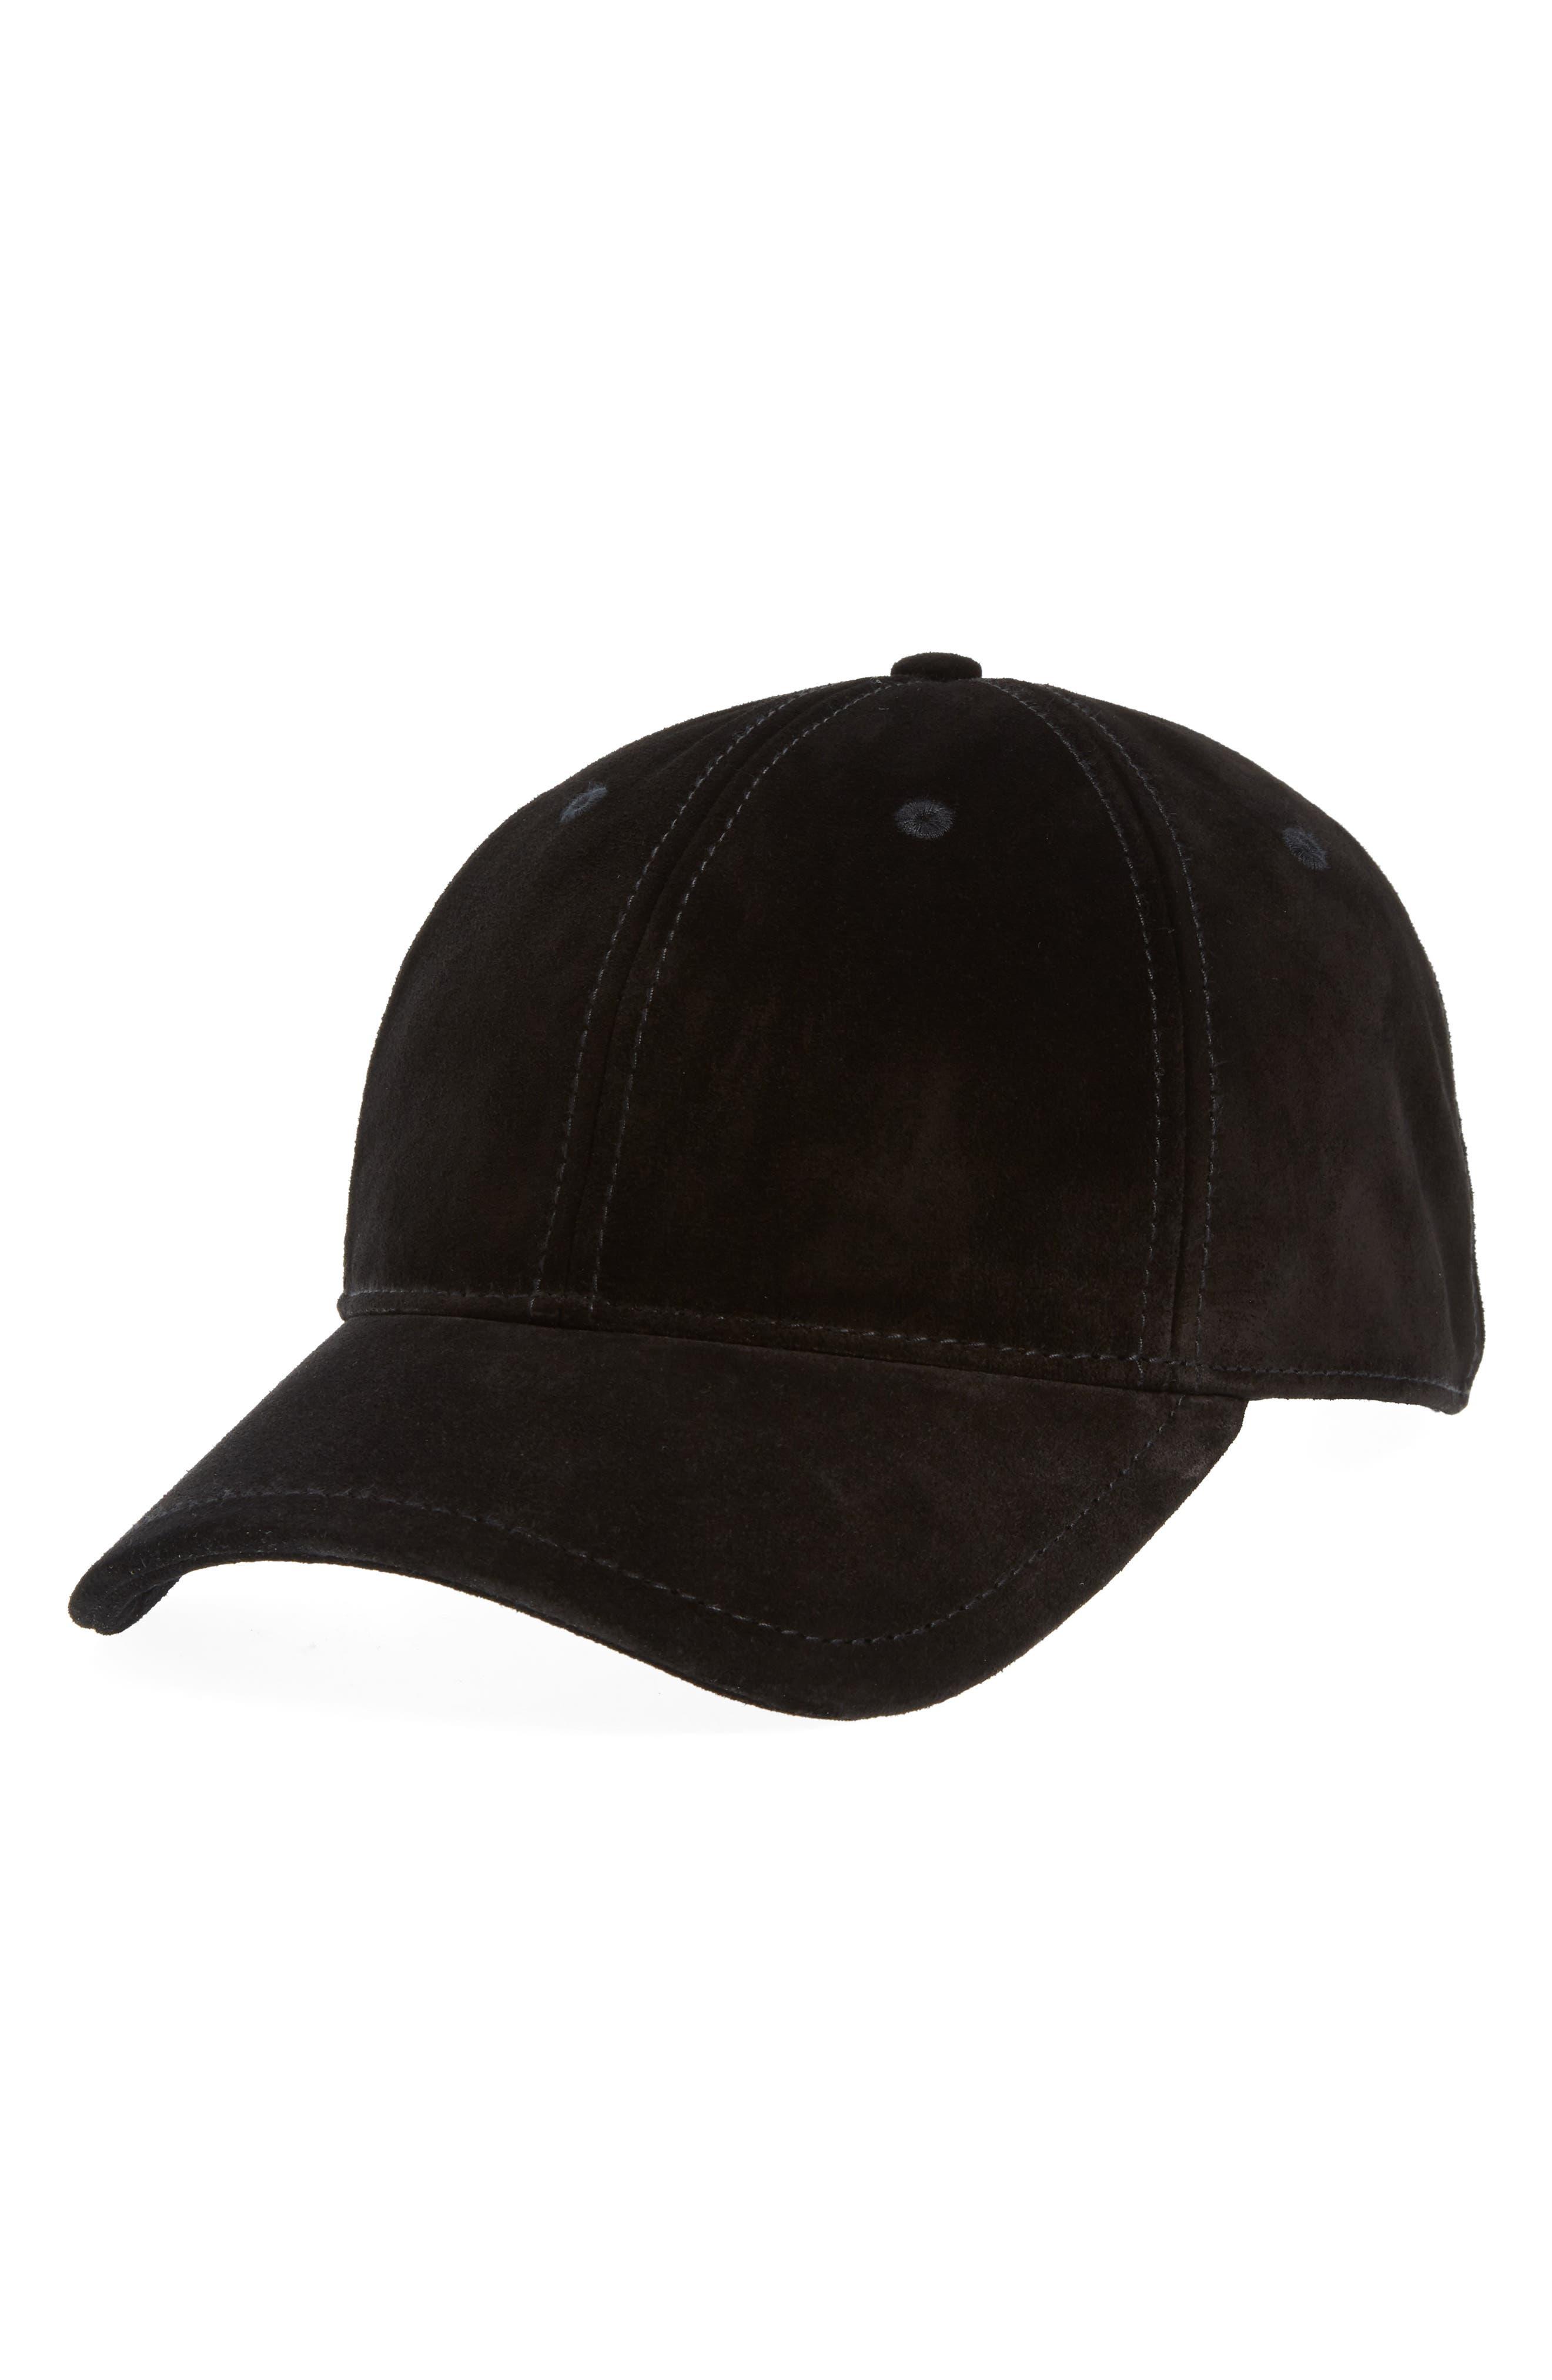 Lenox Ball Cap,                         Main,                         color, Black Suede